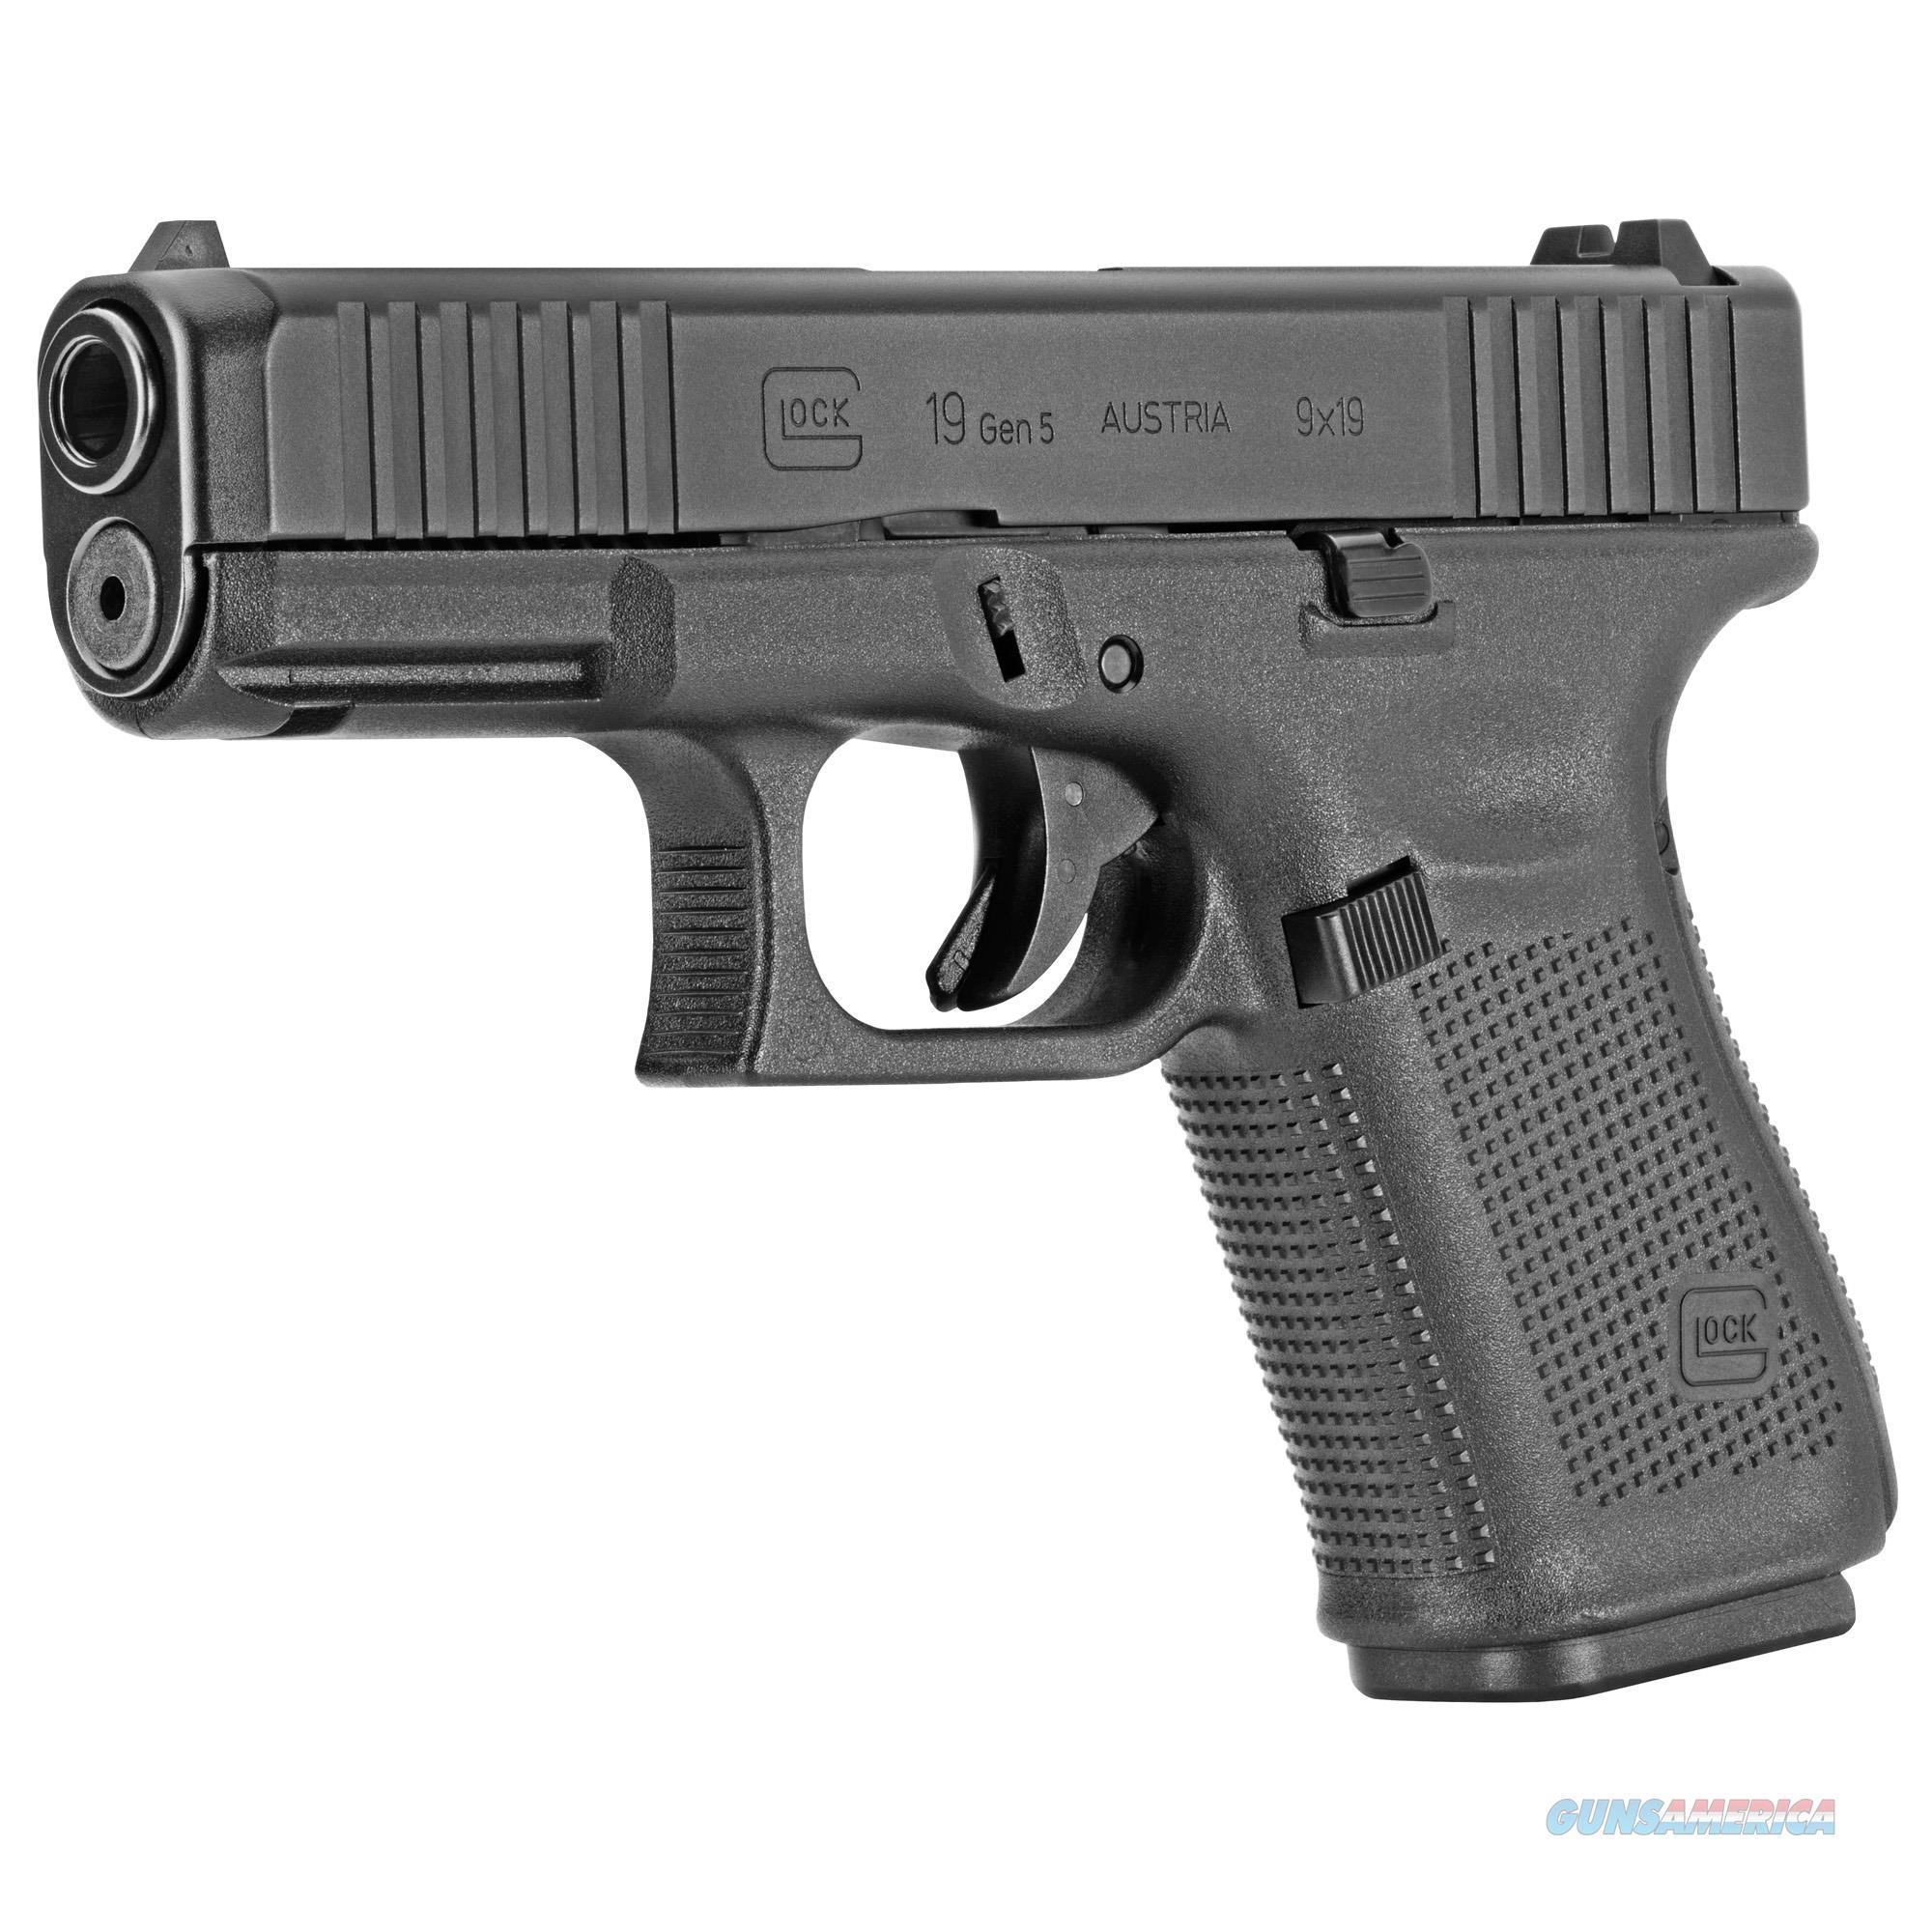 Glock 19 Gen5 9mm NO CUT OUT!  Guns > Pistols > Glock Pistols > 19/19X